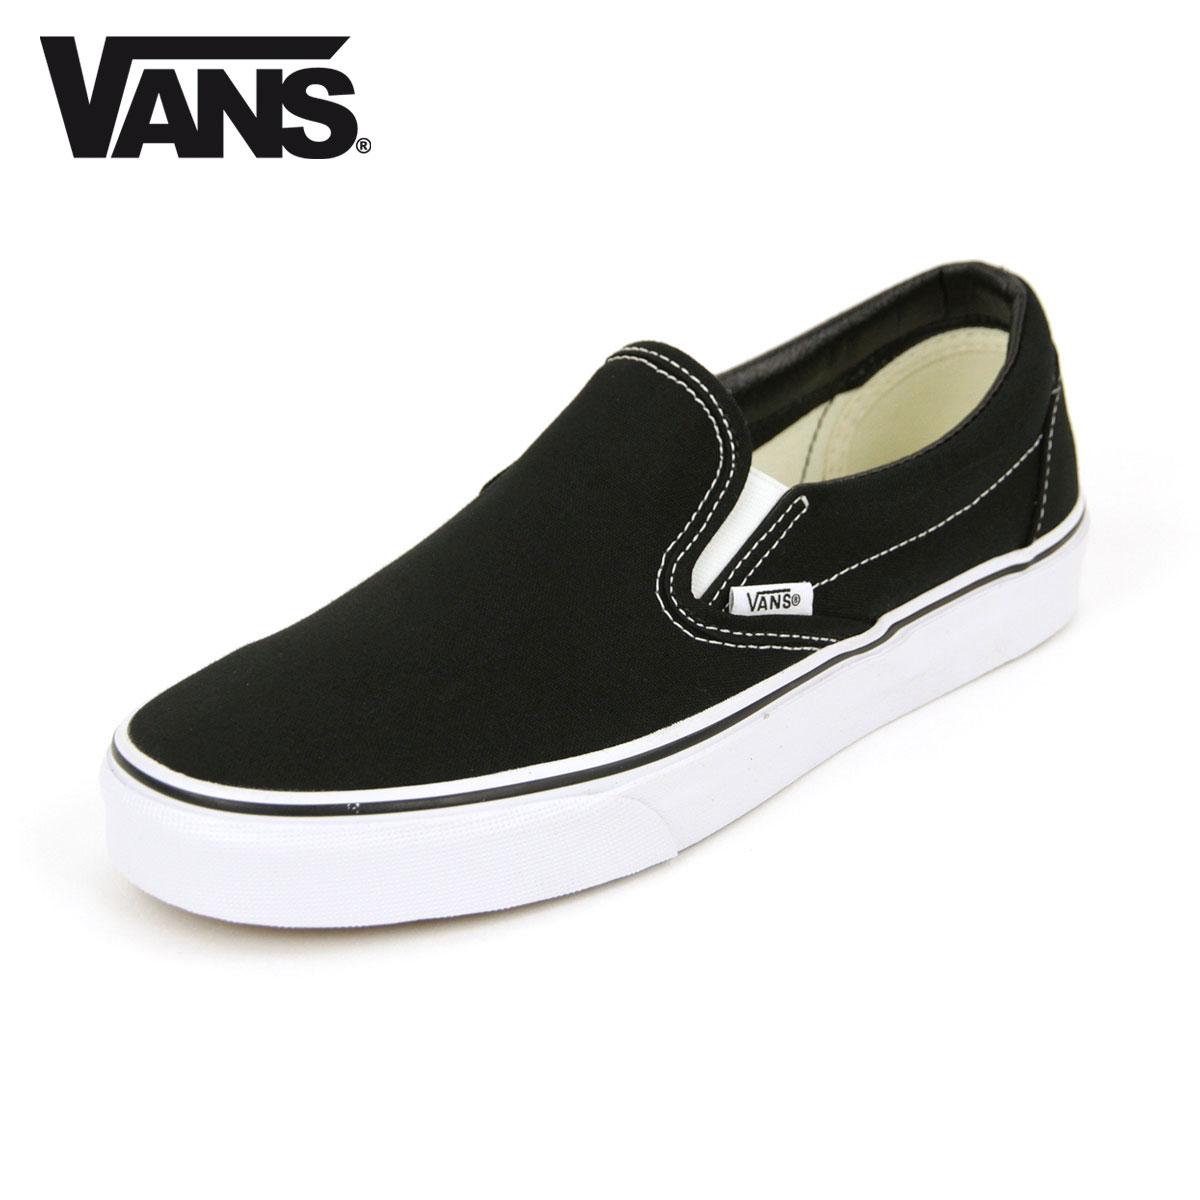 561fdd30a880 Vans VANS regular store men shoes classical music slip-ons VANS CLASSIC SLIP -ON ...